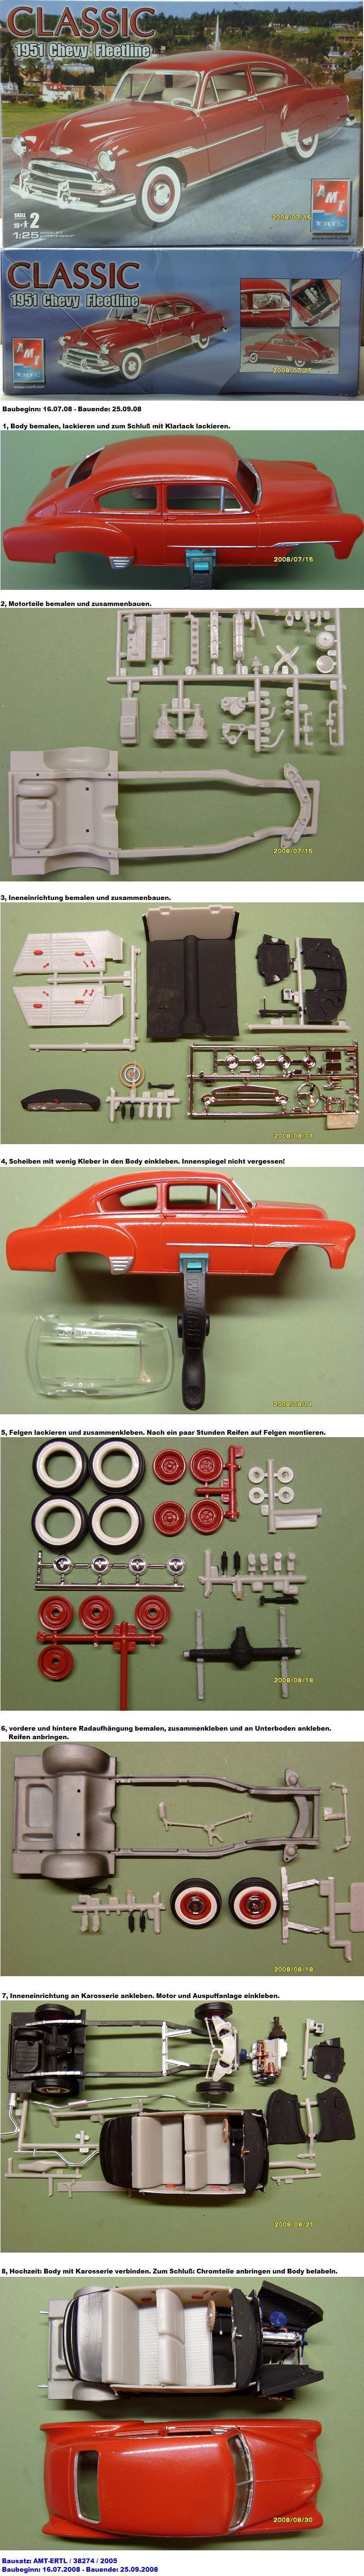 Erfreut Mustang Kabelbaumdiagramm Fotos - Schaltplan Serie Circuit ...